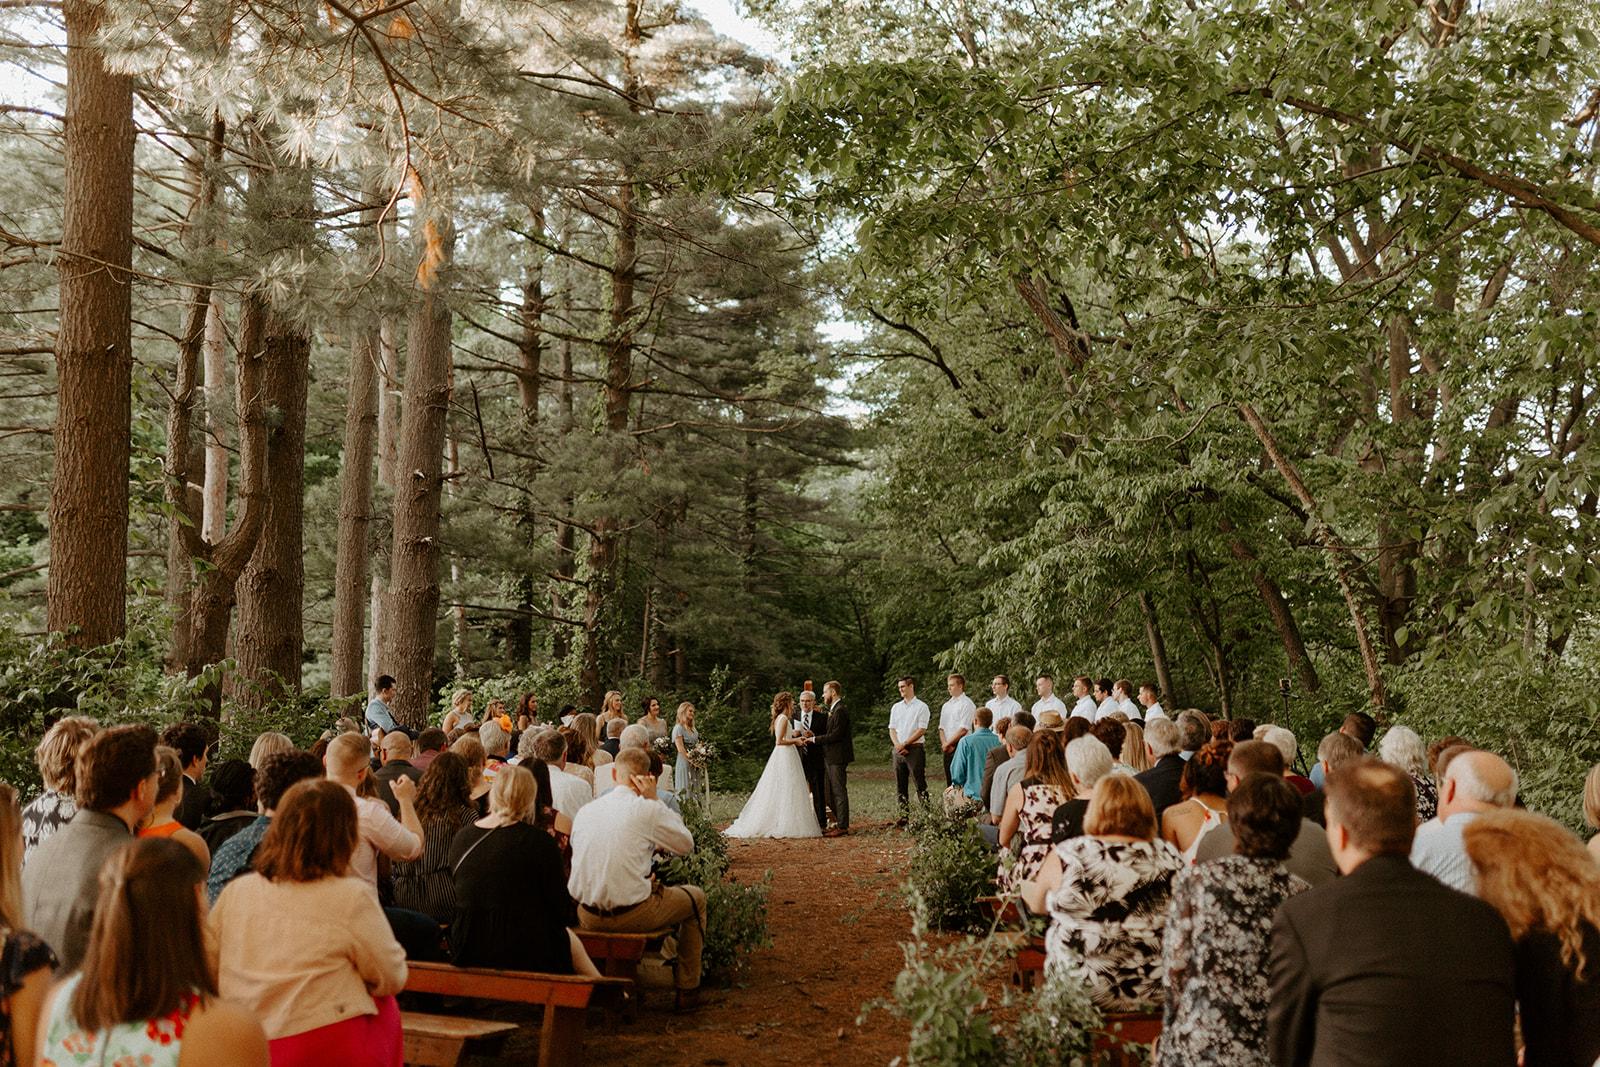 camp_wokanda_peoria_illinois_wedding_photographer_wright_photographs_bliese_0270.jpg